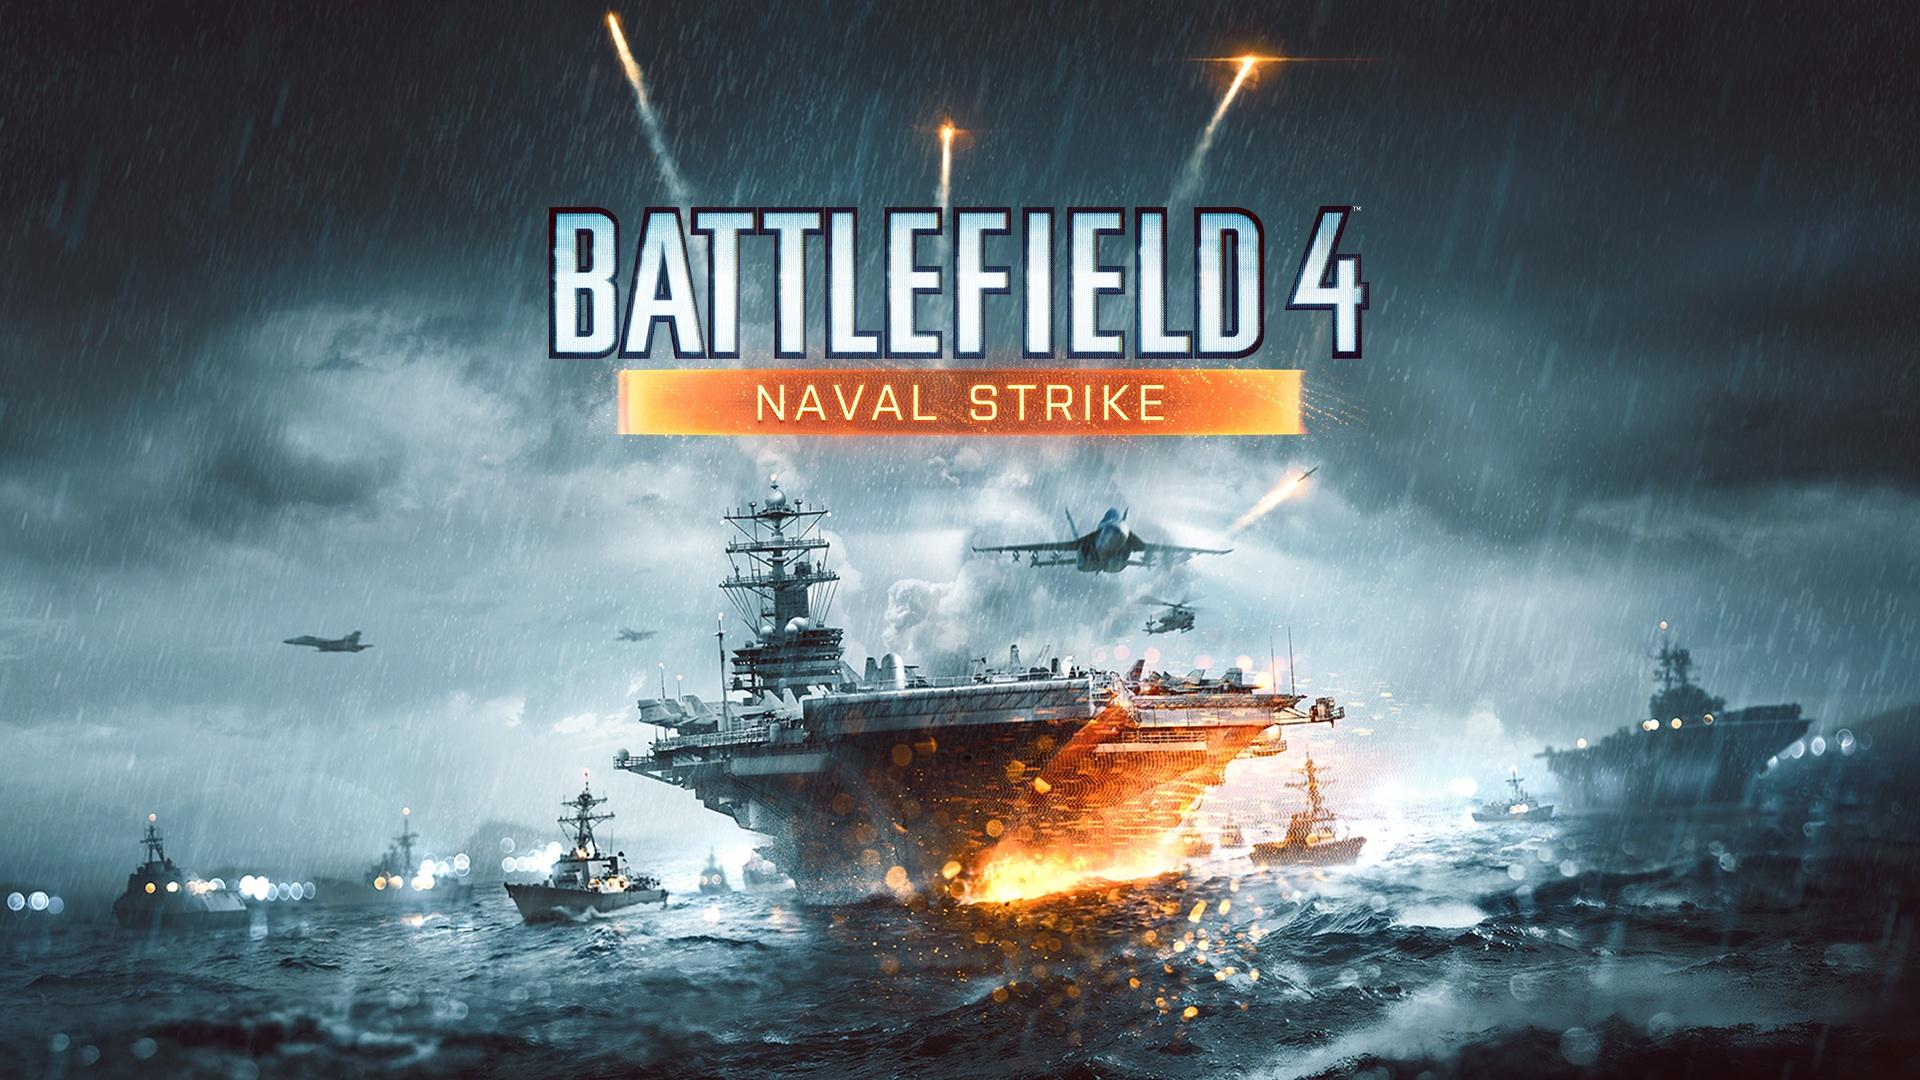 Free Download Battlefield 4 Naval Strike Wallpapers Hd Wallpapers